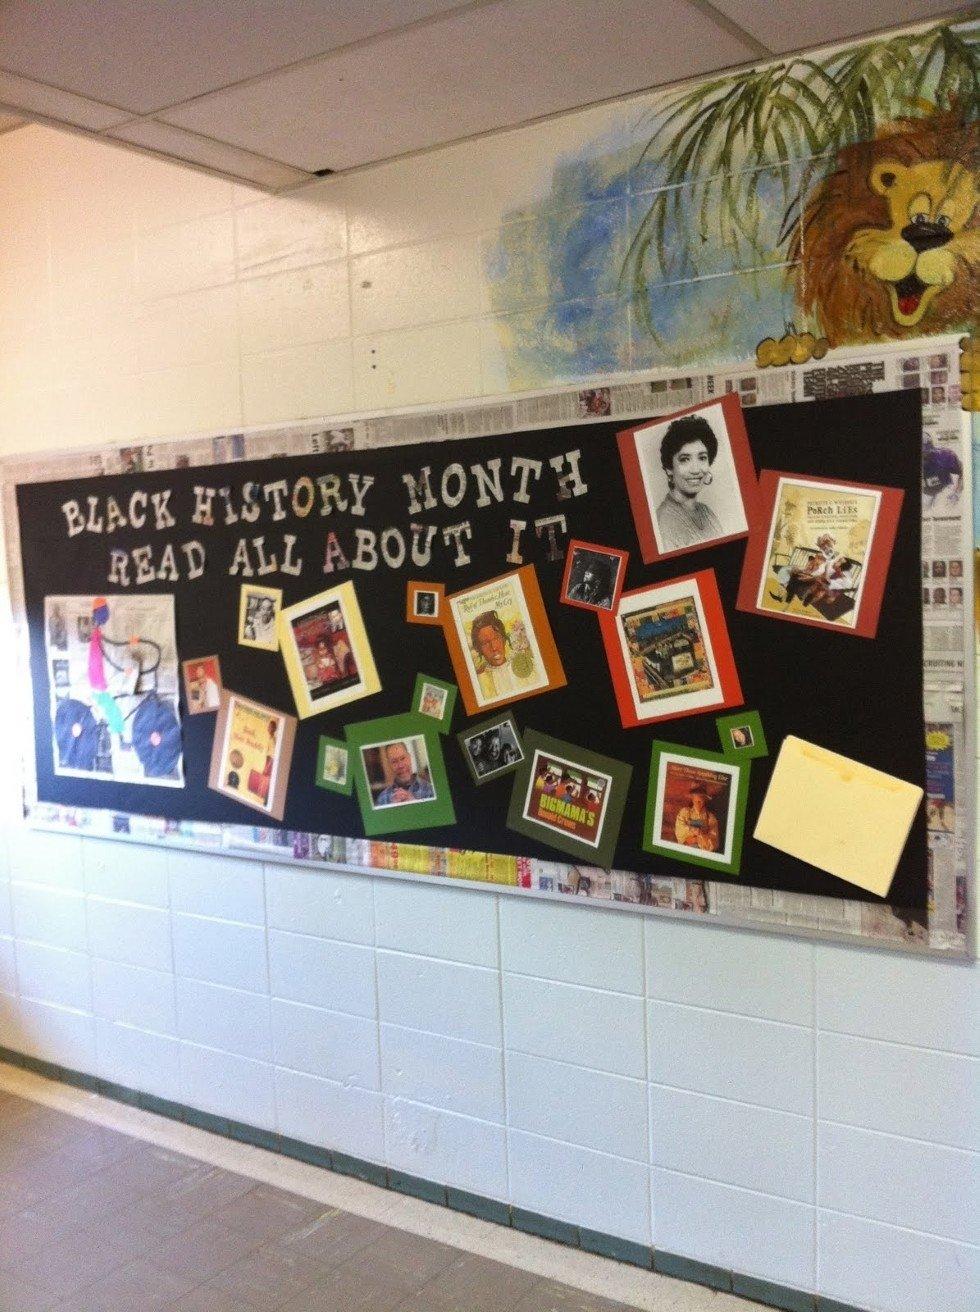 10 Fabulous Black History Month Bulletin Board Ideas black history bulletin board ideas bulletin board ideas designs 2021